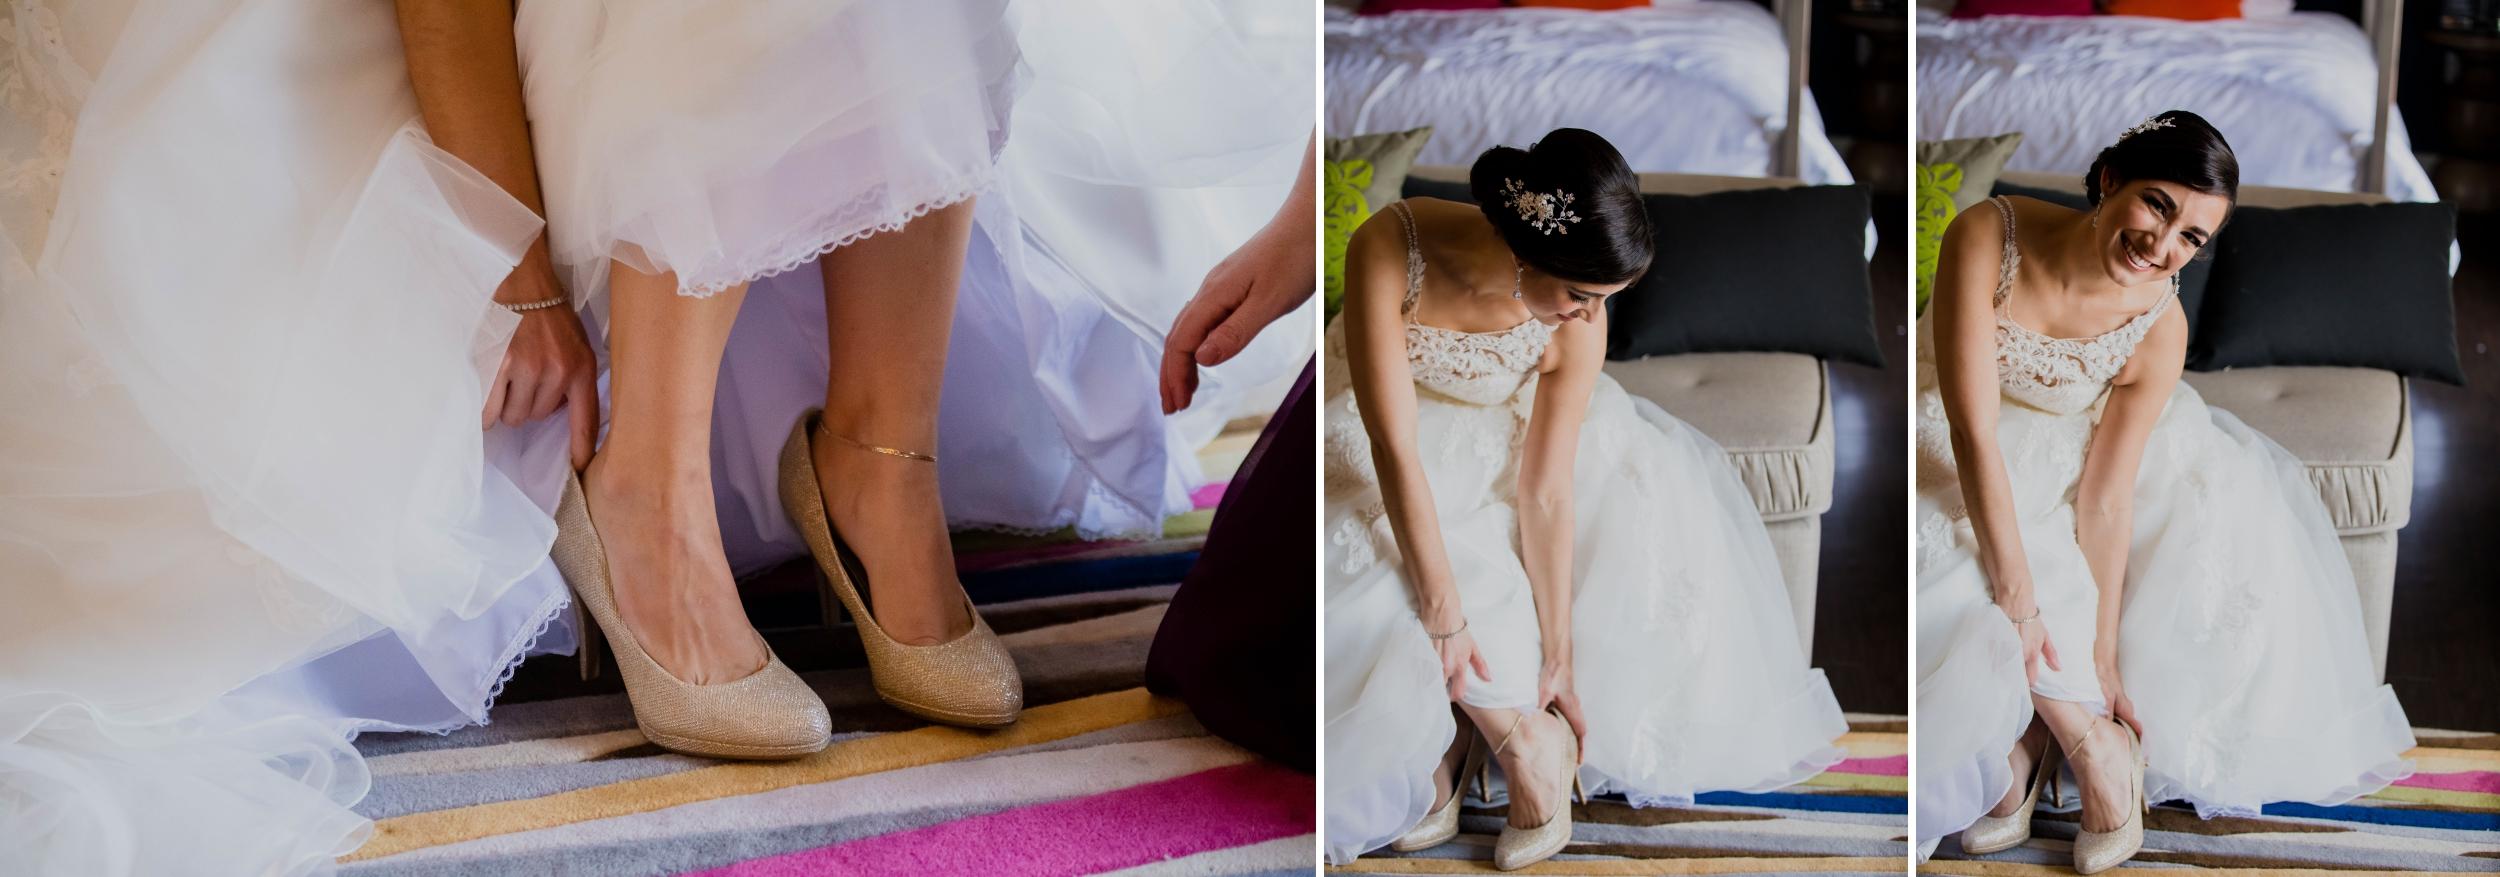 Wedding Hotel Colonnade Coral Gables - Santy Martinez 8.jpg